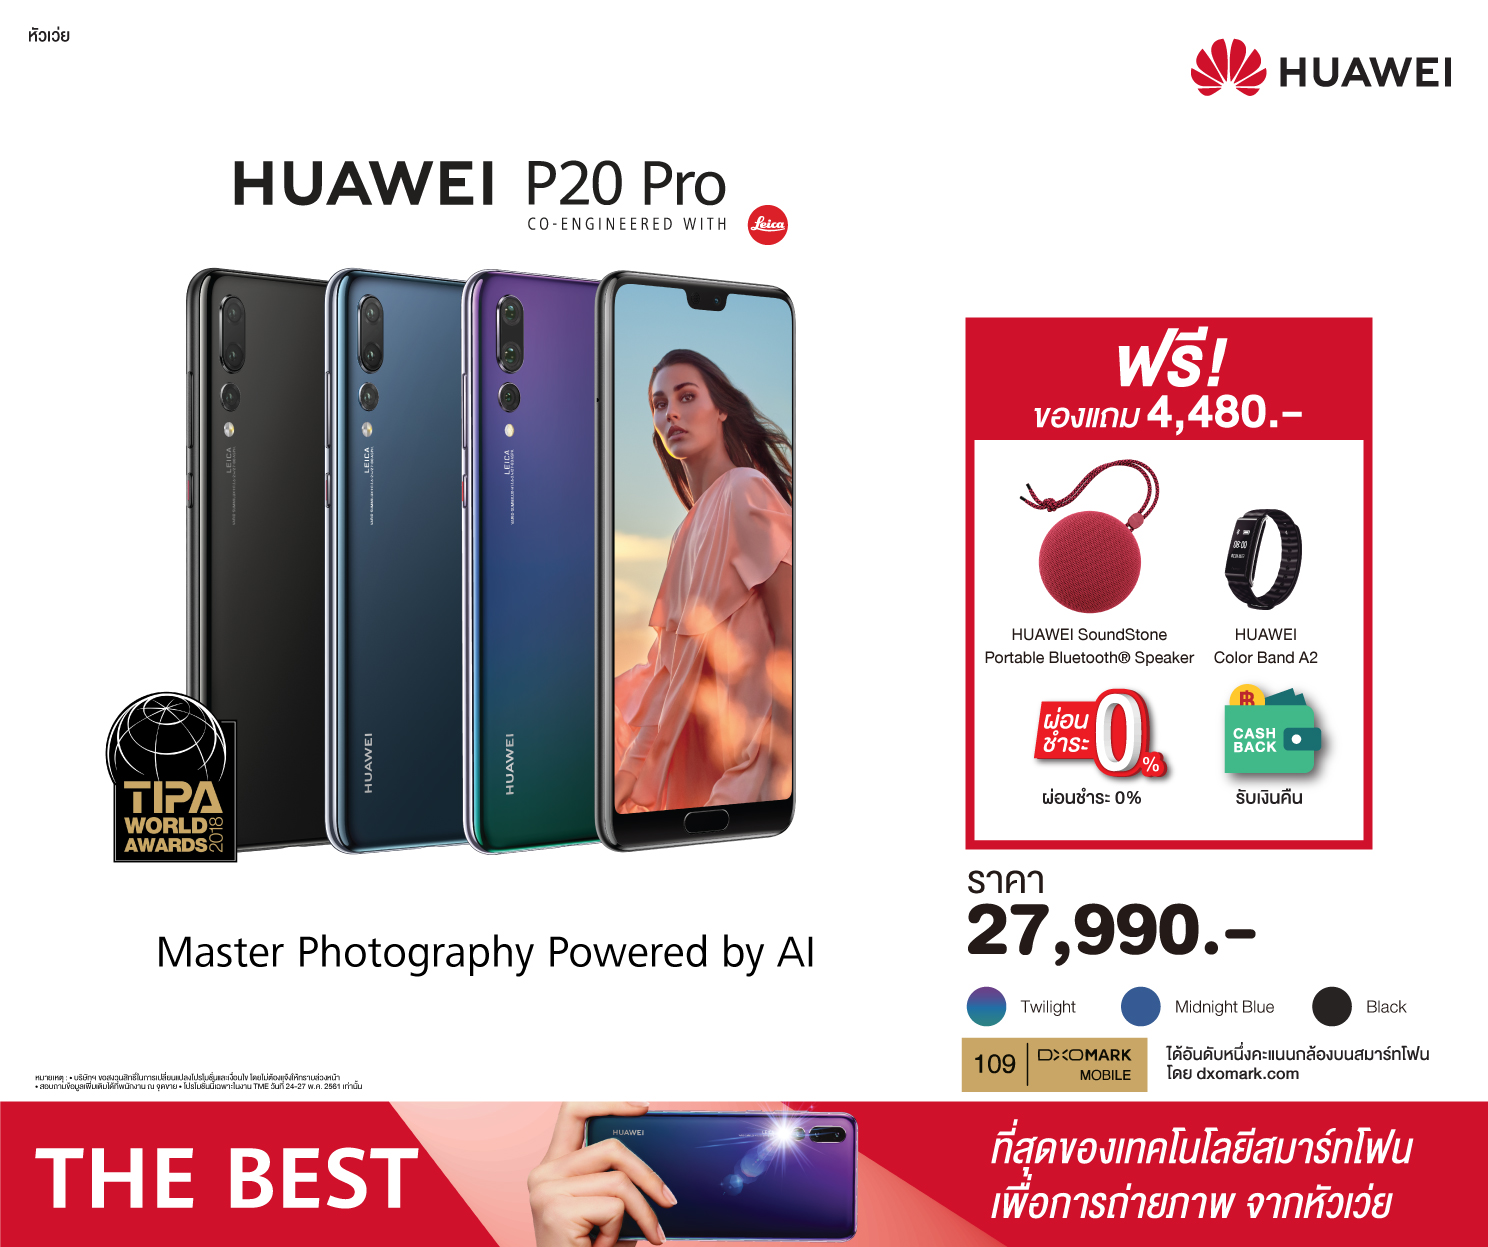 TME 1 - HUAWEI P20 Pro